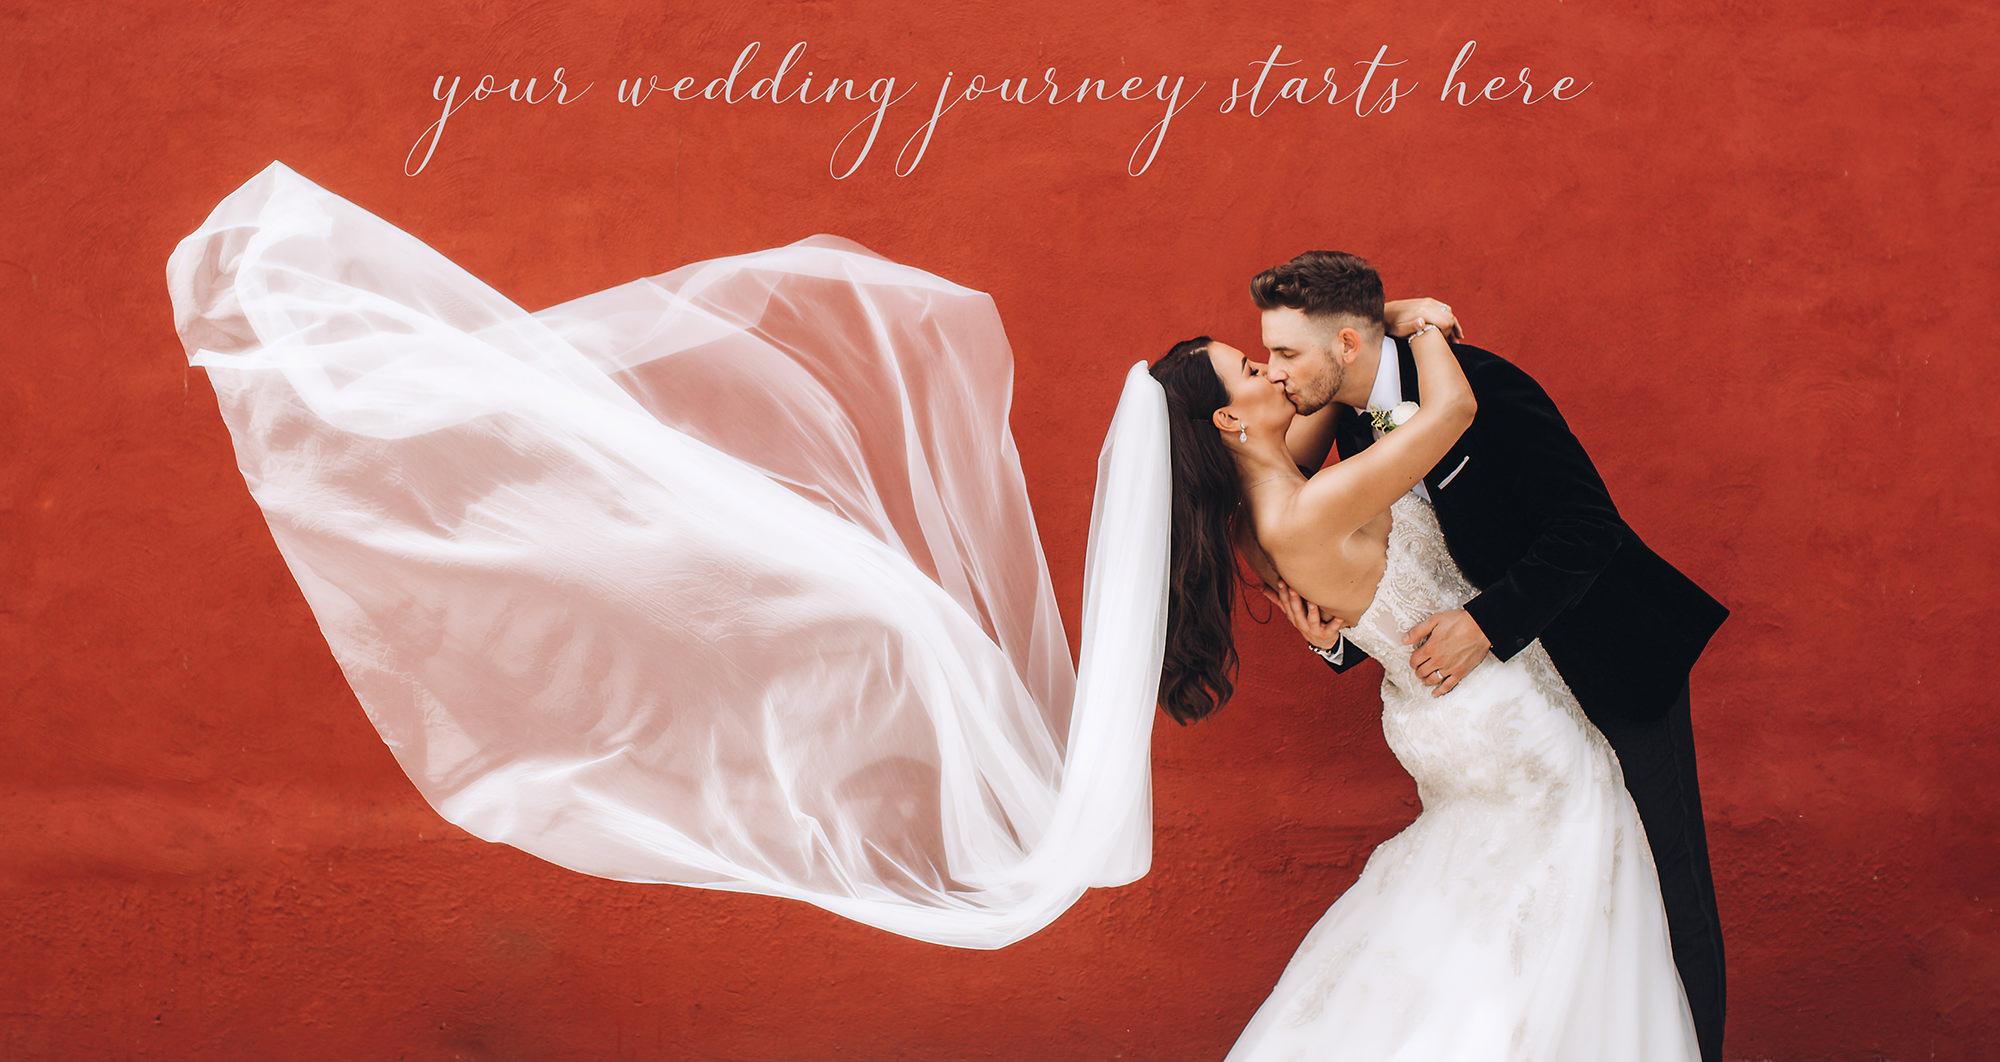 wedding photographers in rotherham, Sheffield, Doncaster and Barnsley, Yorkshire wedding photographers.